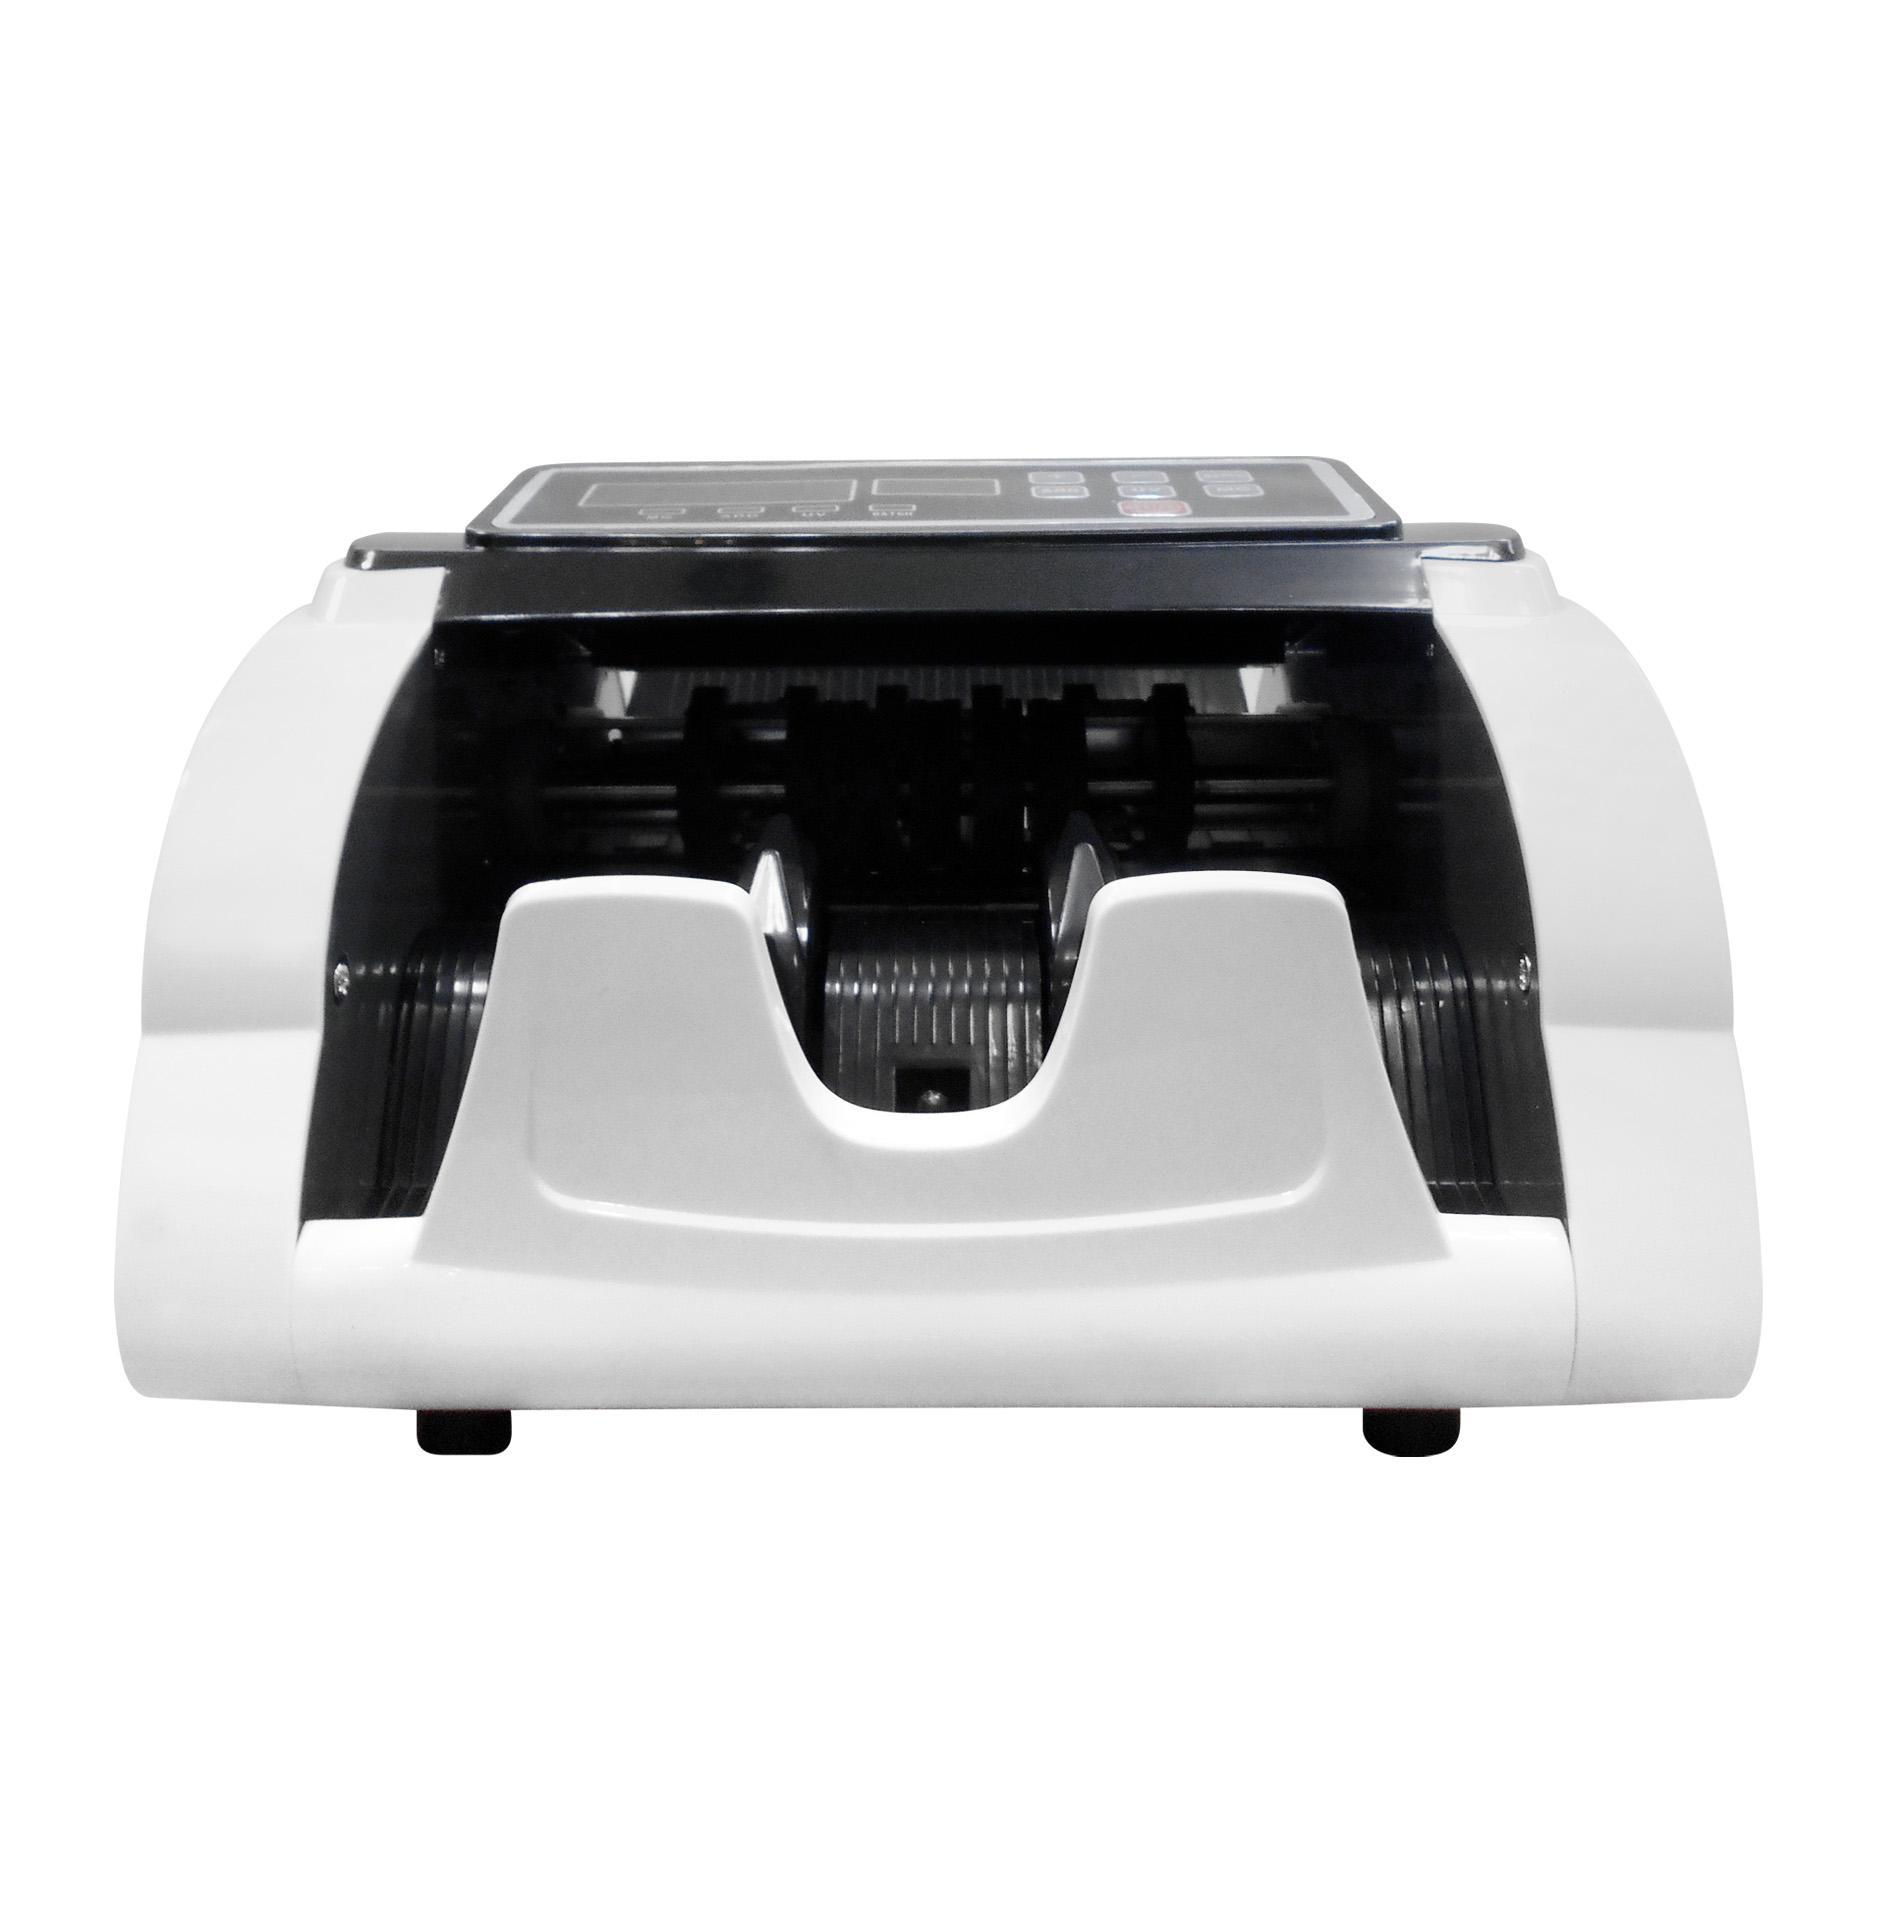 Mesin Penghitung Hitung Uang Portable Handy Bill Counter Kasir Money Secure Ld 22a Detail Gambar Murata 805b Jn Alat Aman Terbaru